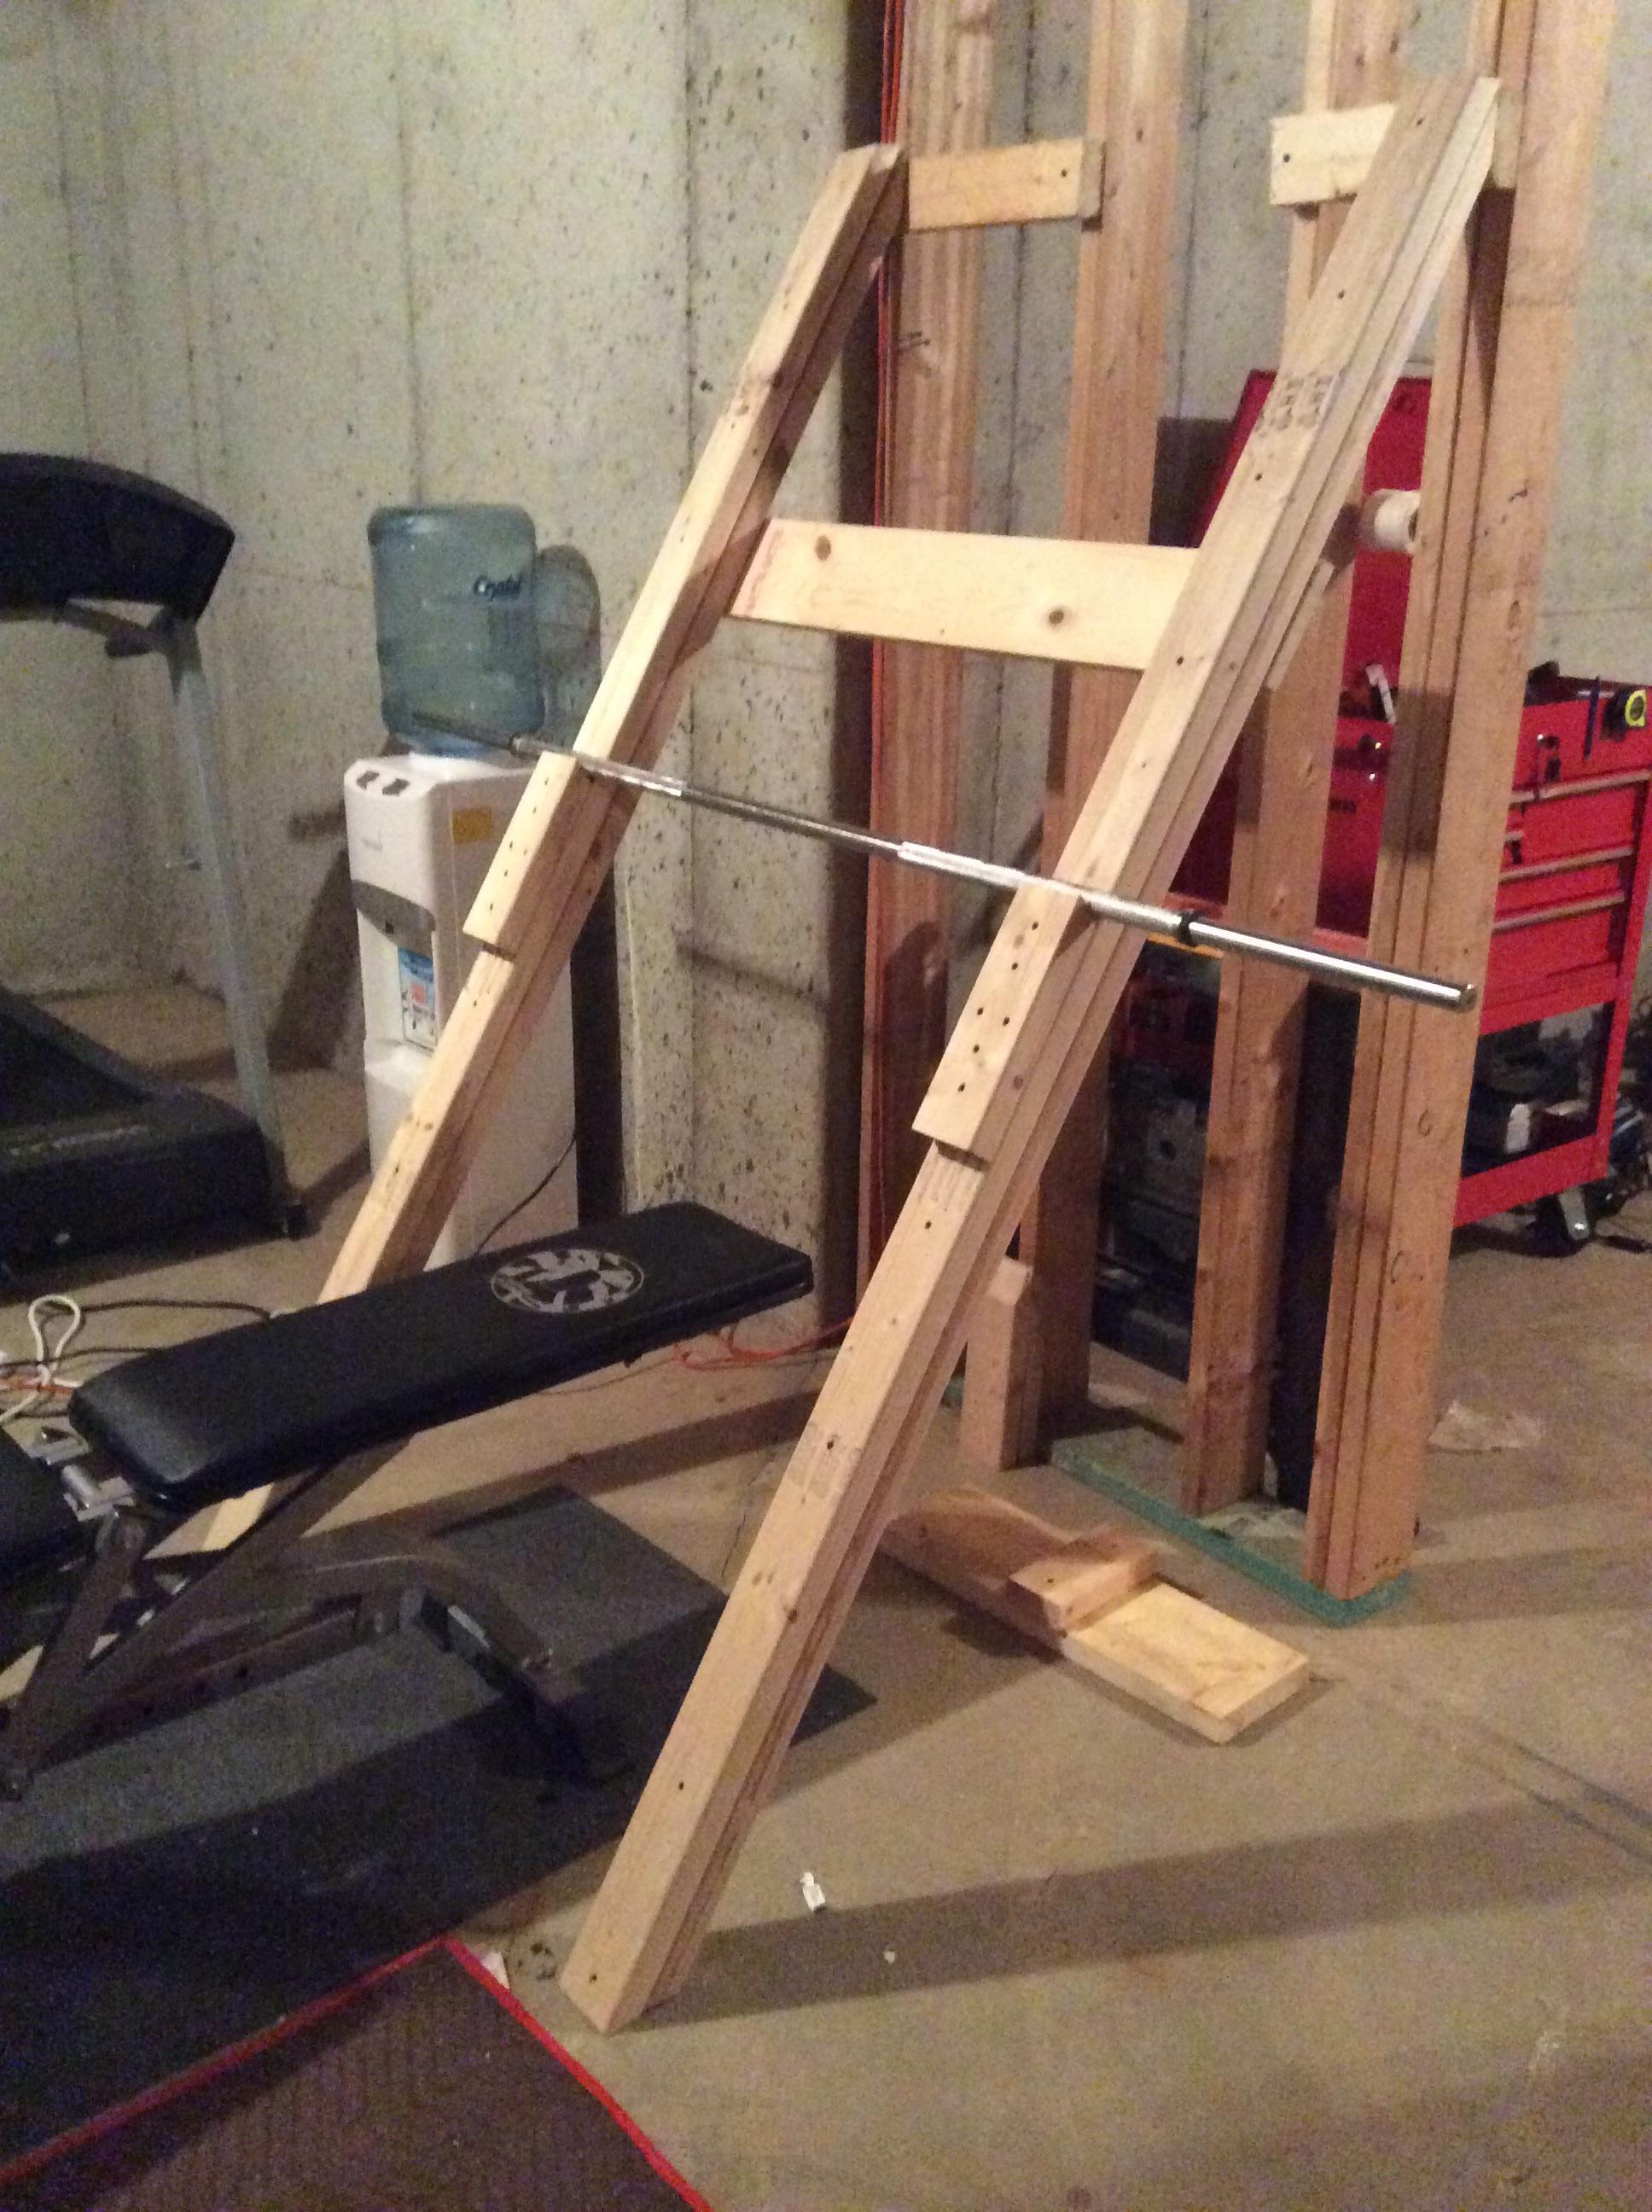 products squat kustom ipf alternative kit rack combo bench competition komborack press er kombo eleiko powerlifting